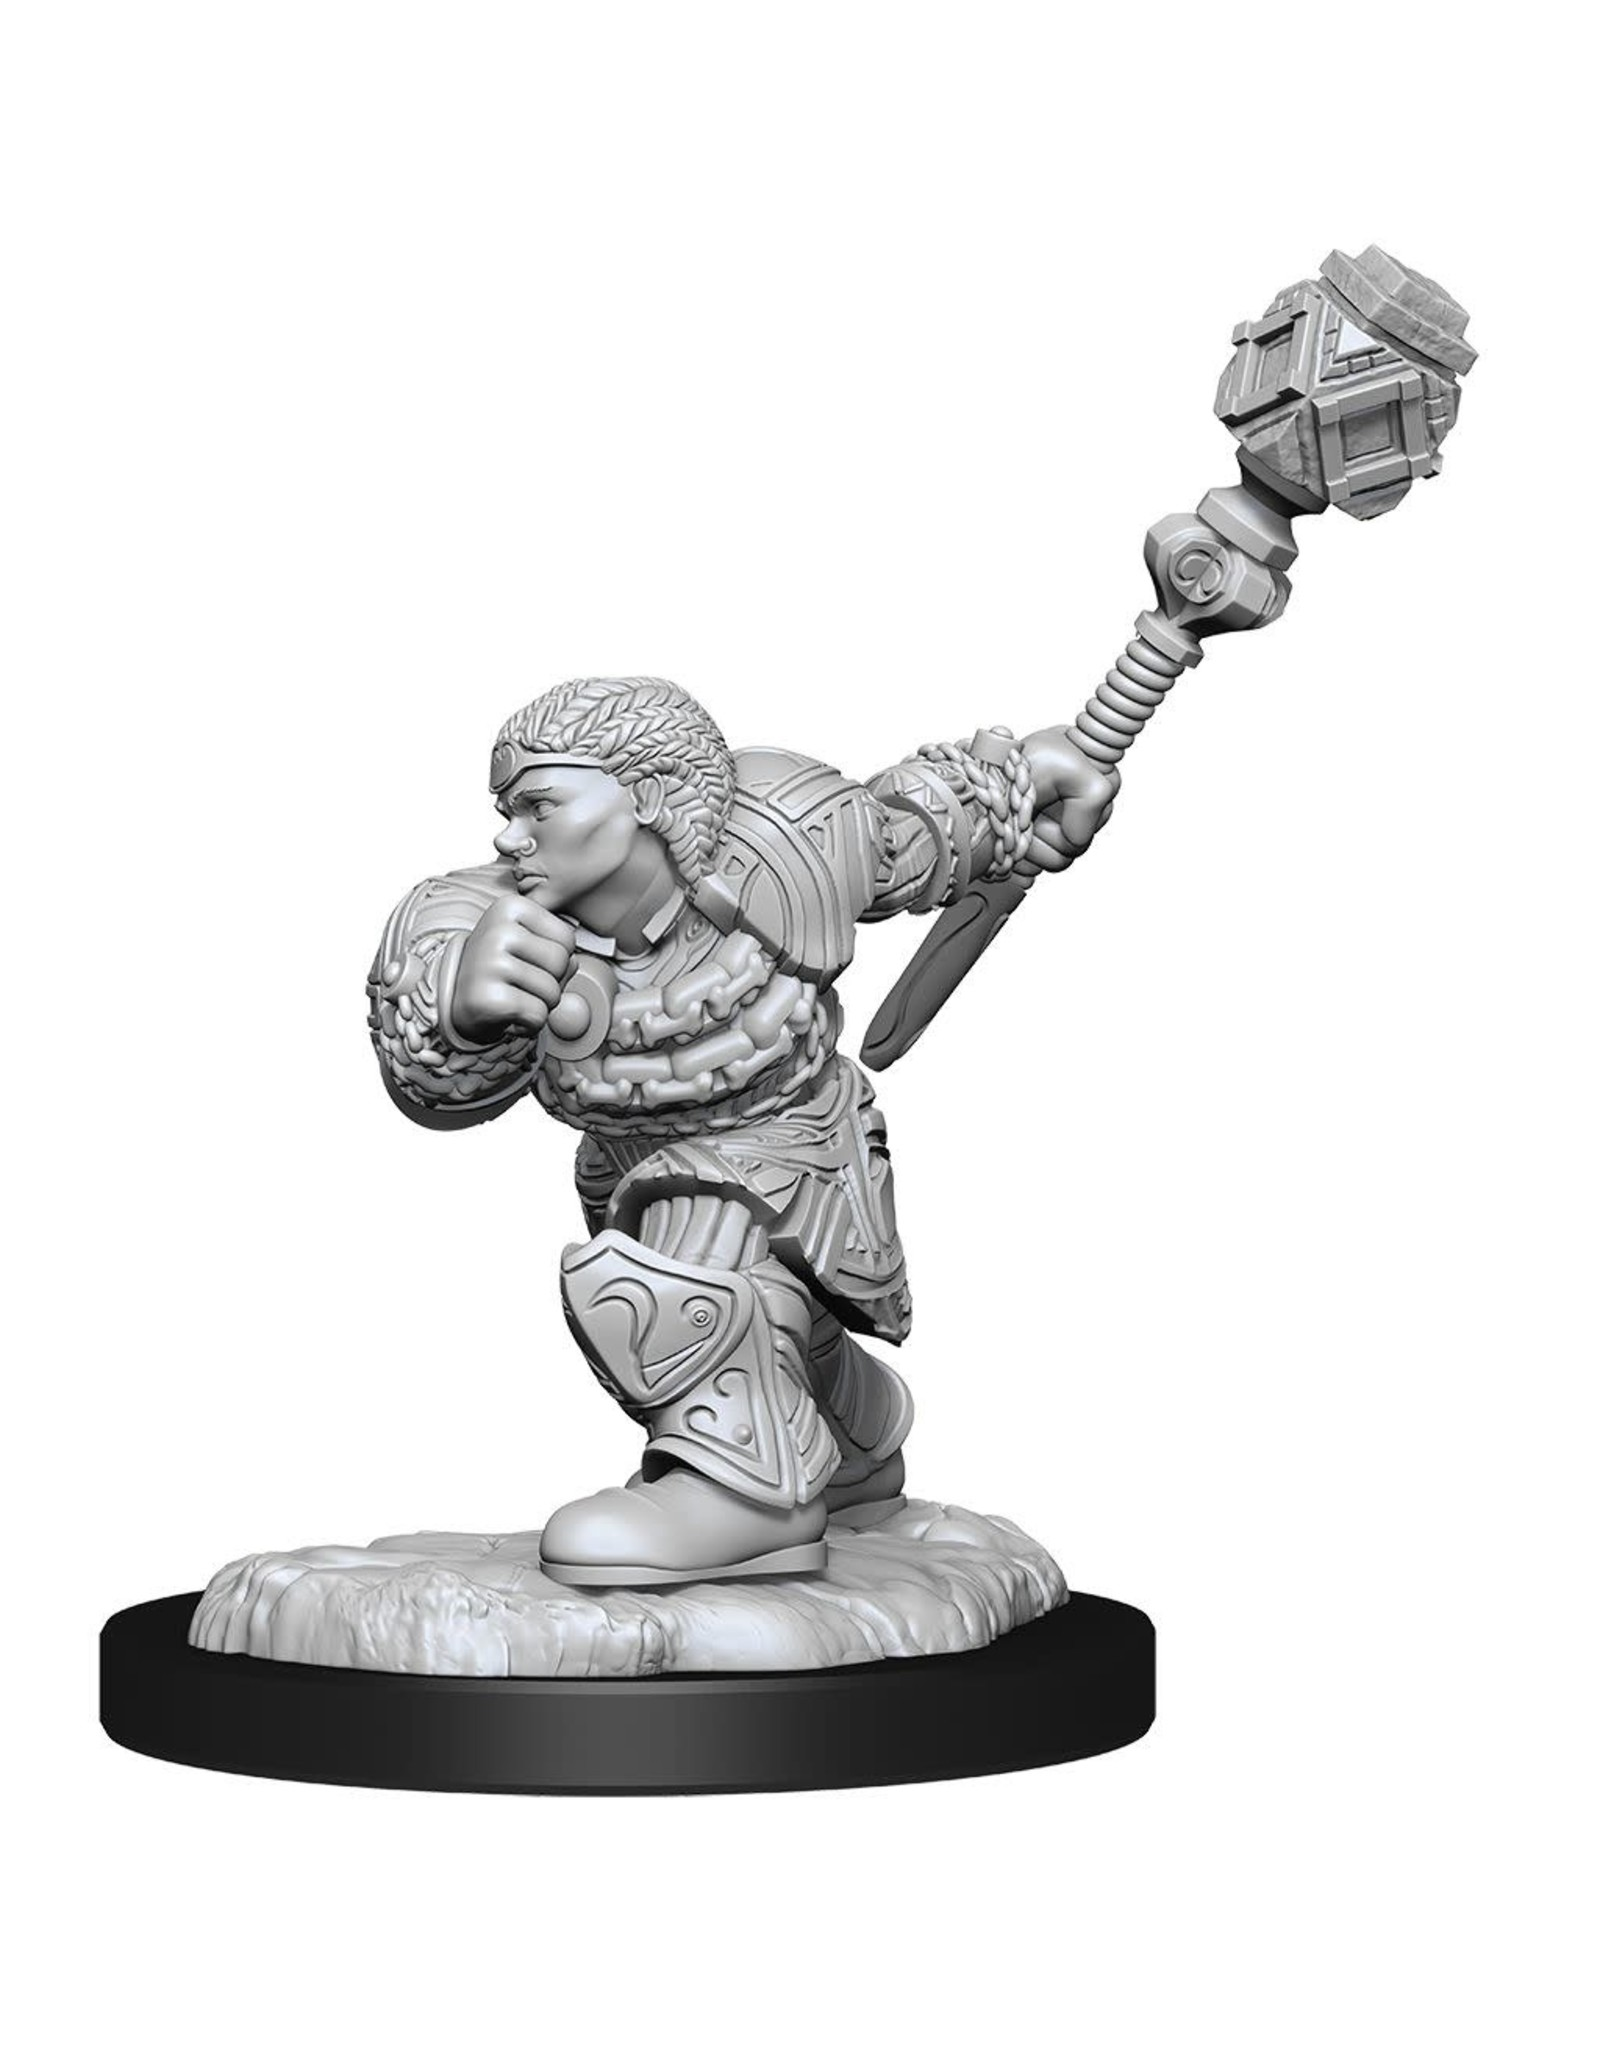 WizKids Magic the Gathering Unpainted Miniatures: W14 Dwarf Fighter & Dwarf Cleric